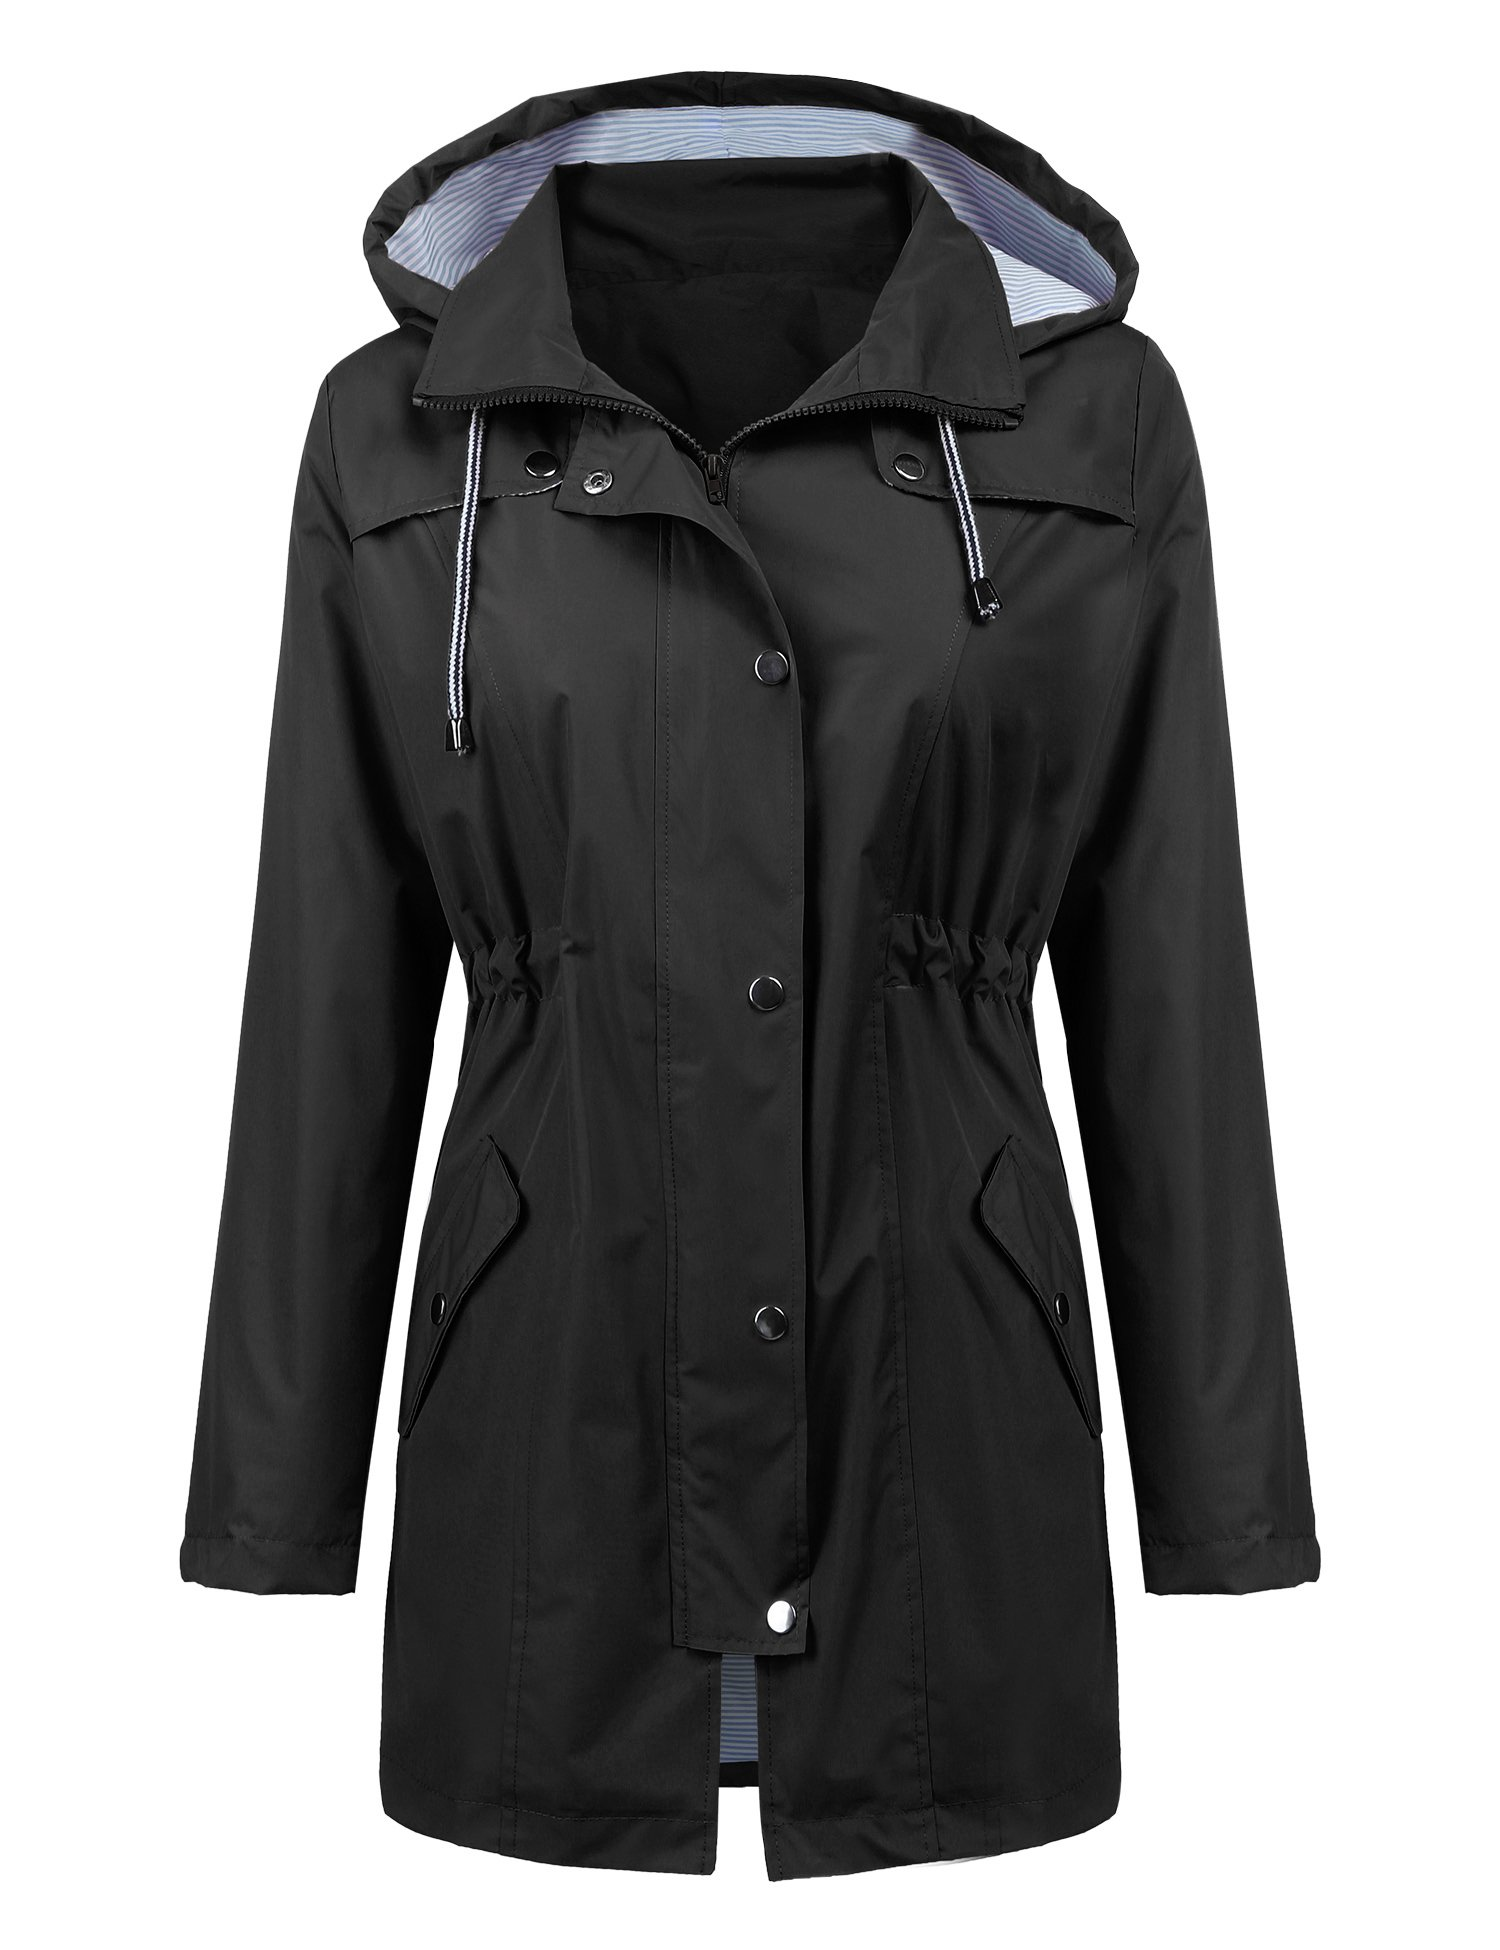 71b62f8d2492c Raincoat Women Waterproof Long Hooded Trench Coats Lined Windbreaker Travel  Jacket product image